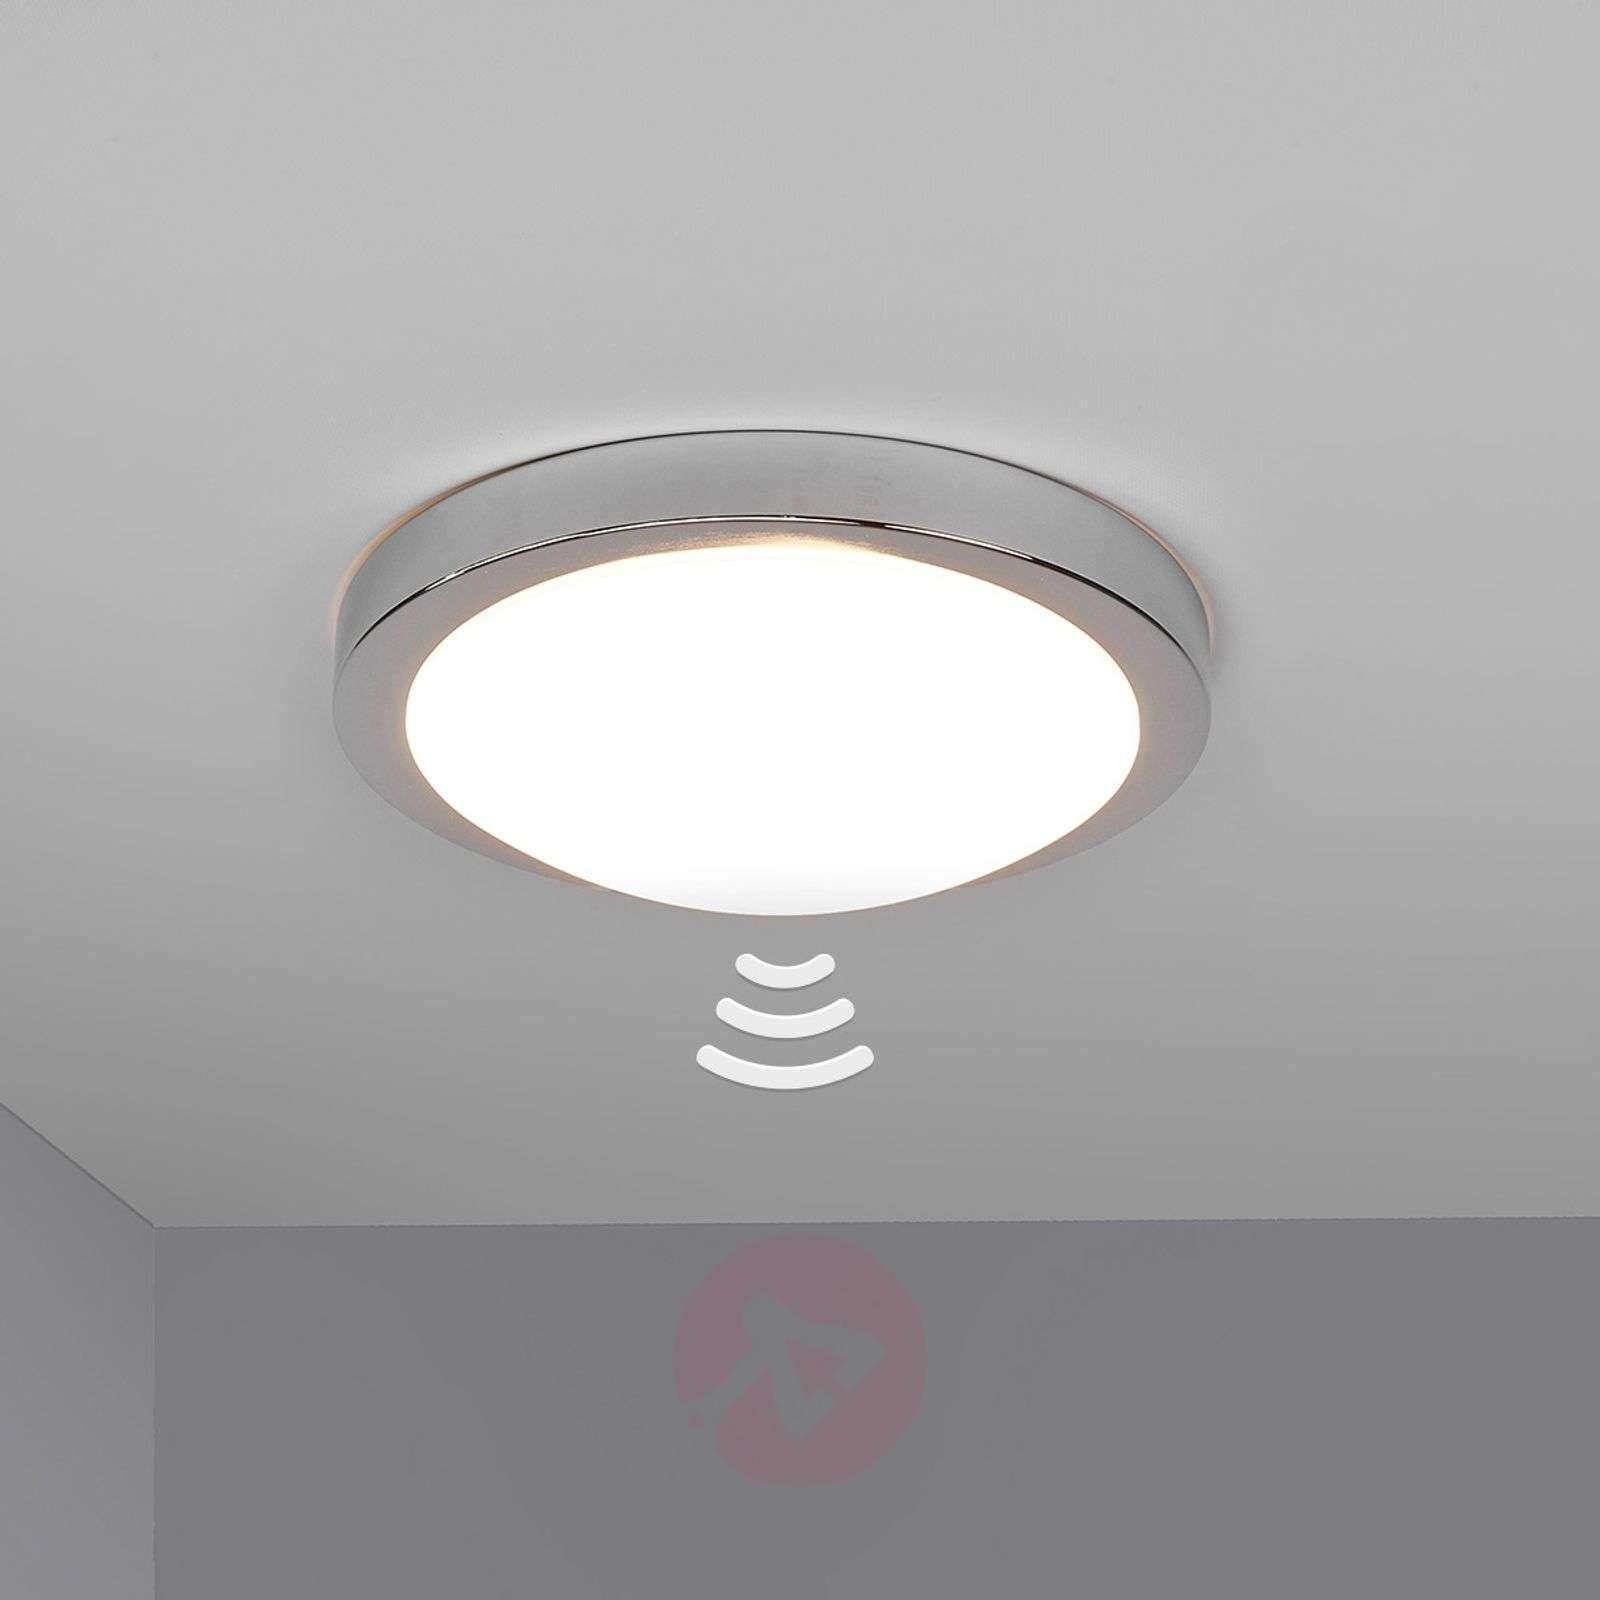 Bathroom Ceiling Light - 4k Wallpapers Design